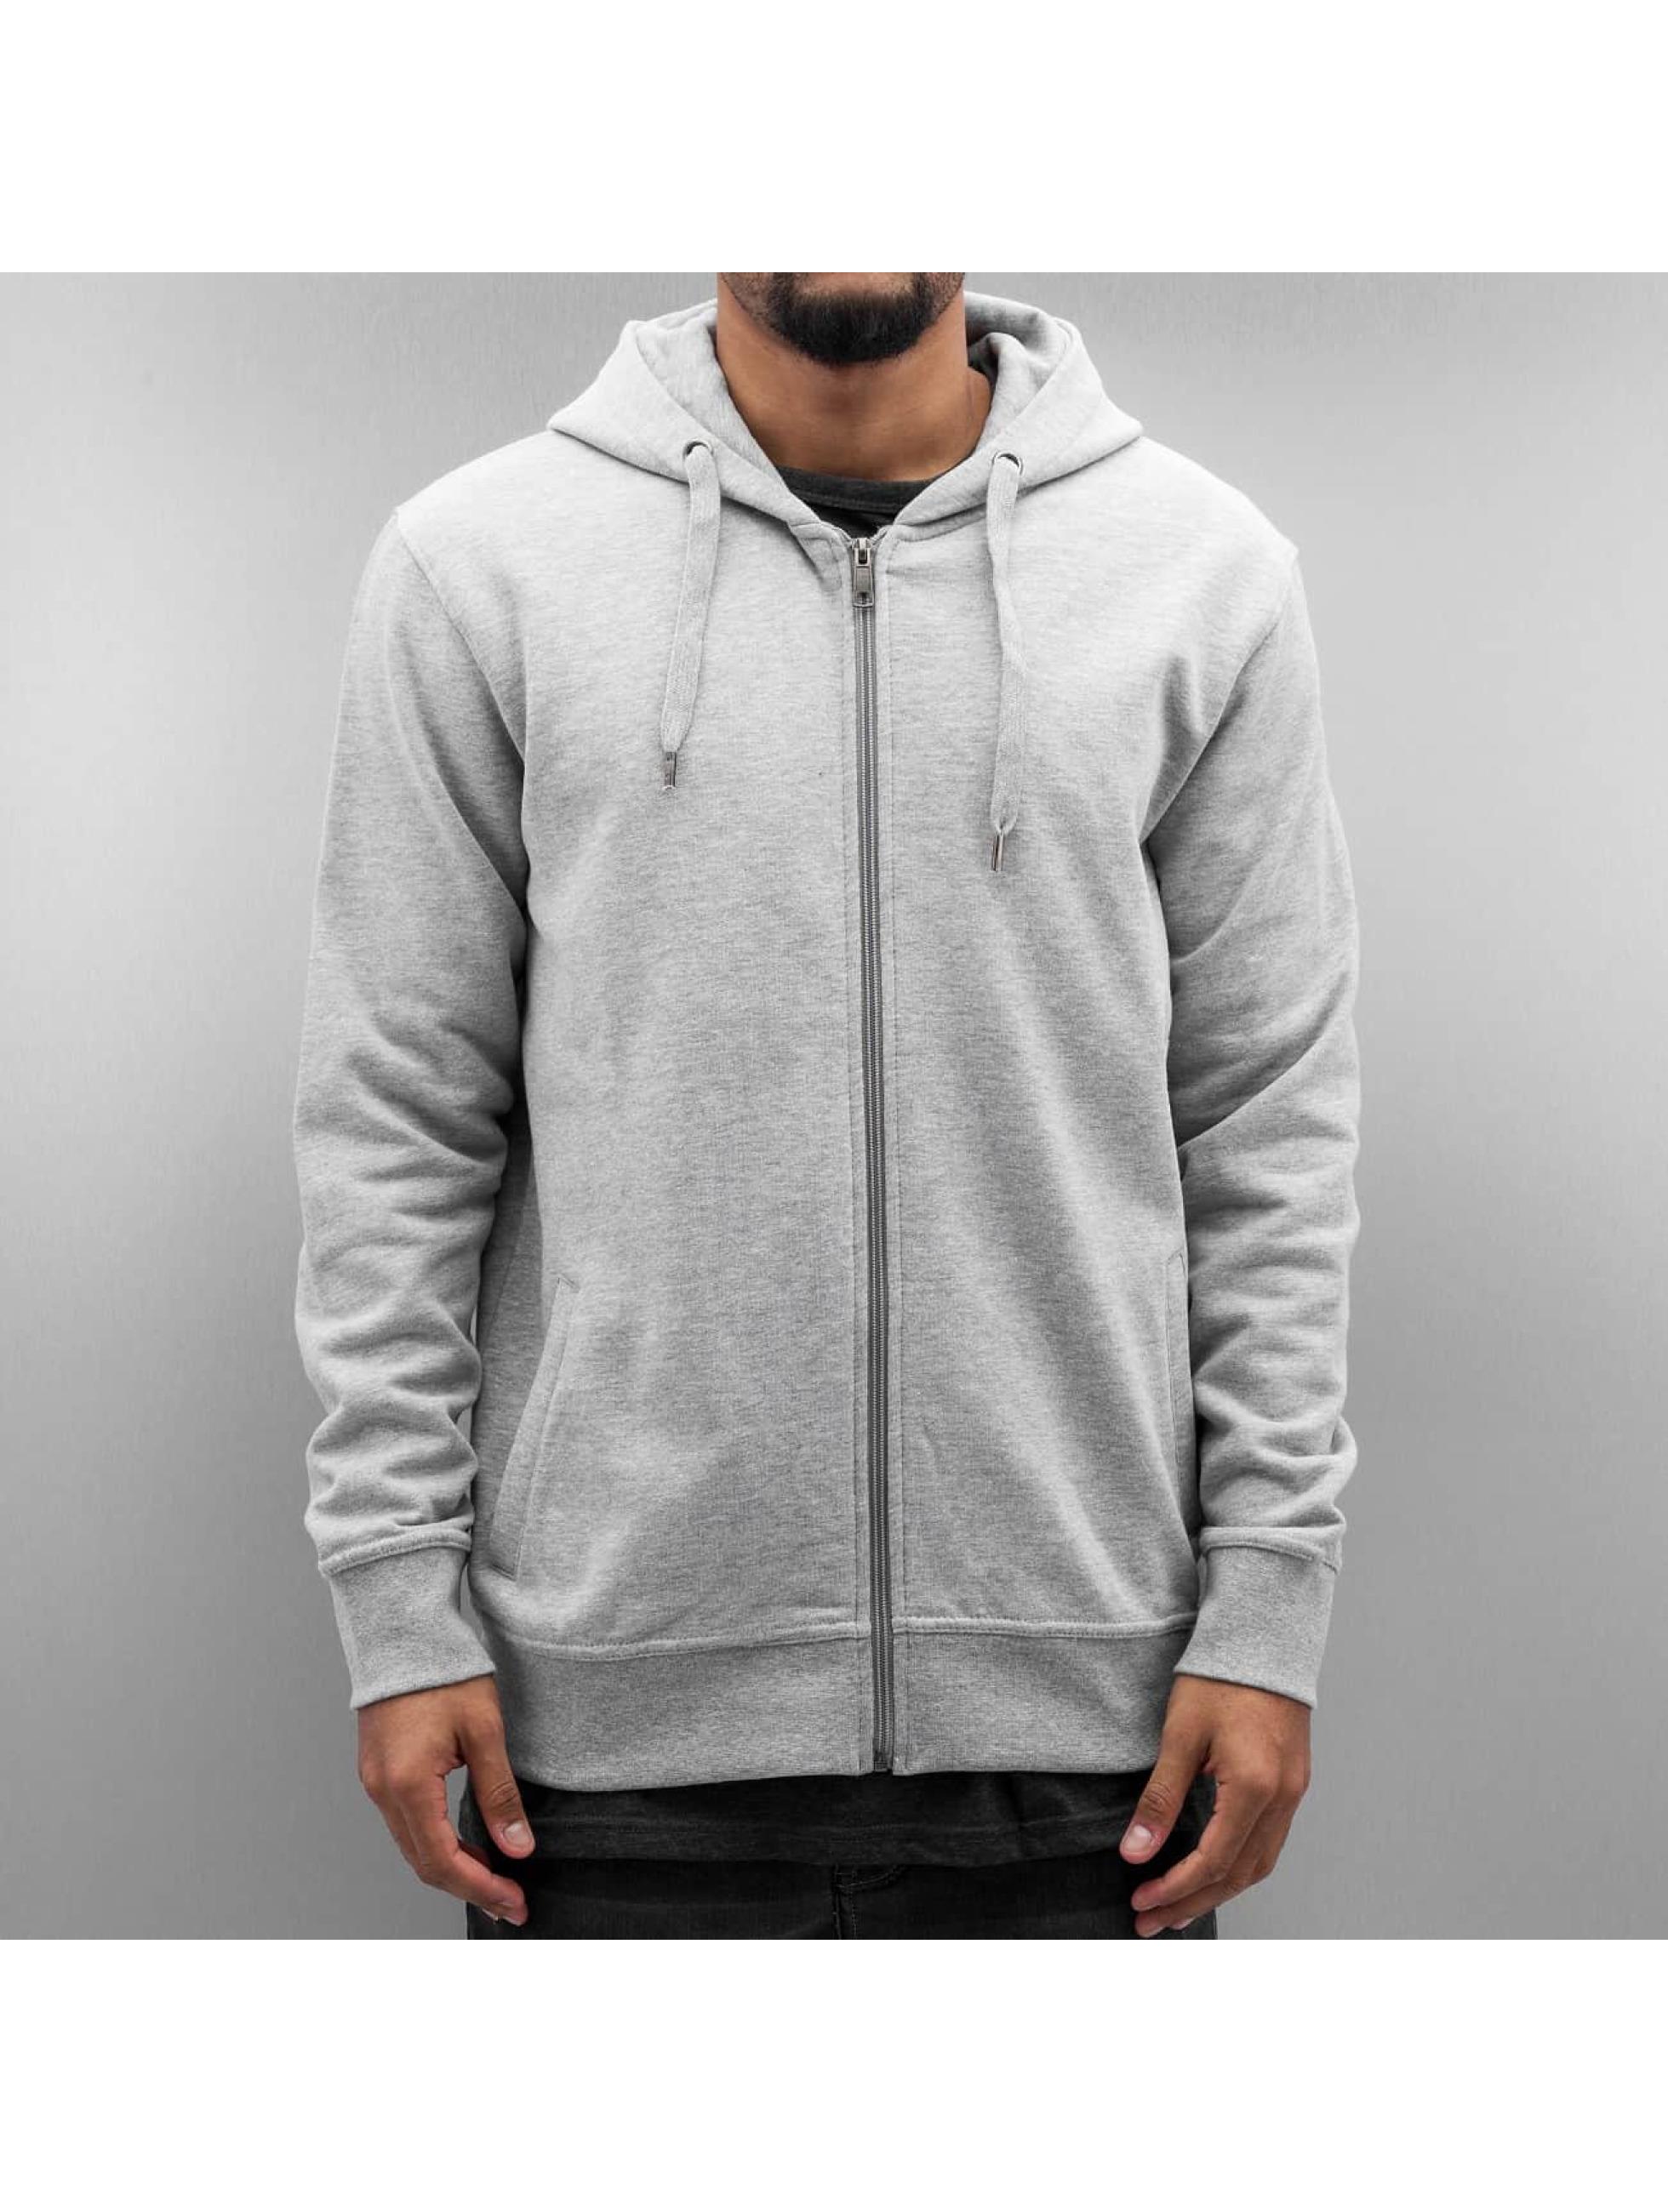 Cyprime Zip Hoodie Organic Cotton grey